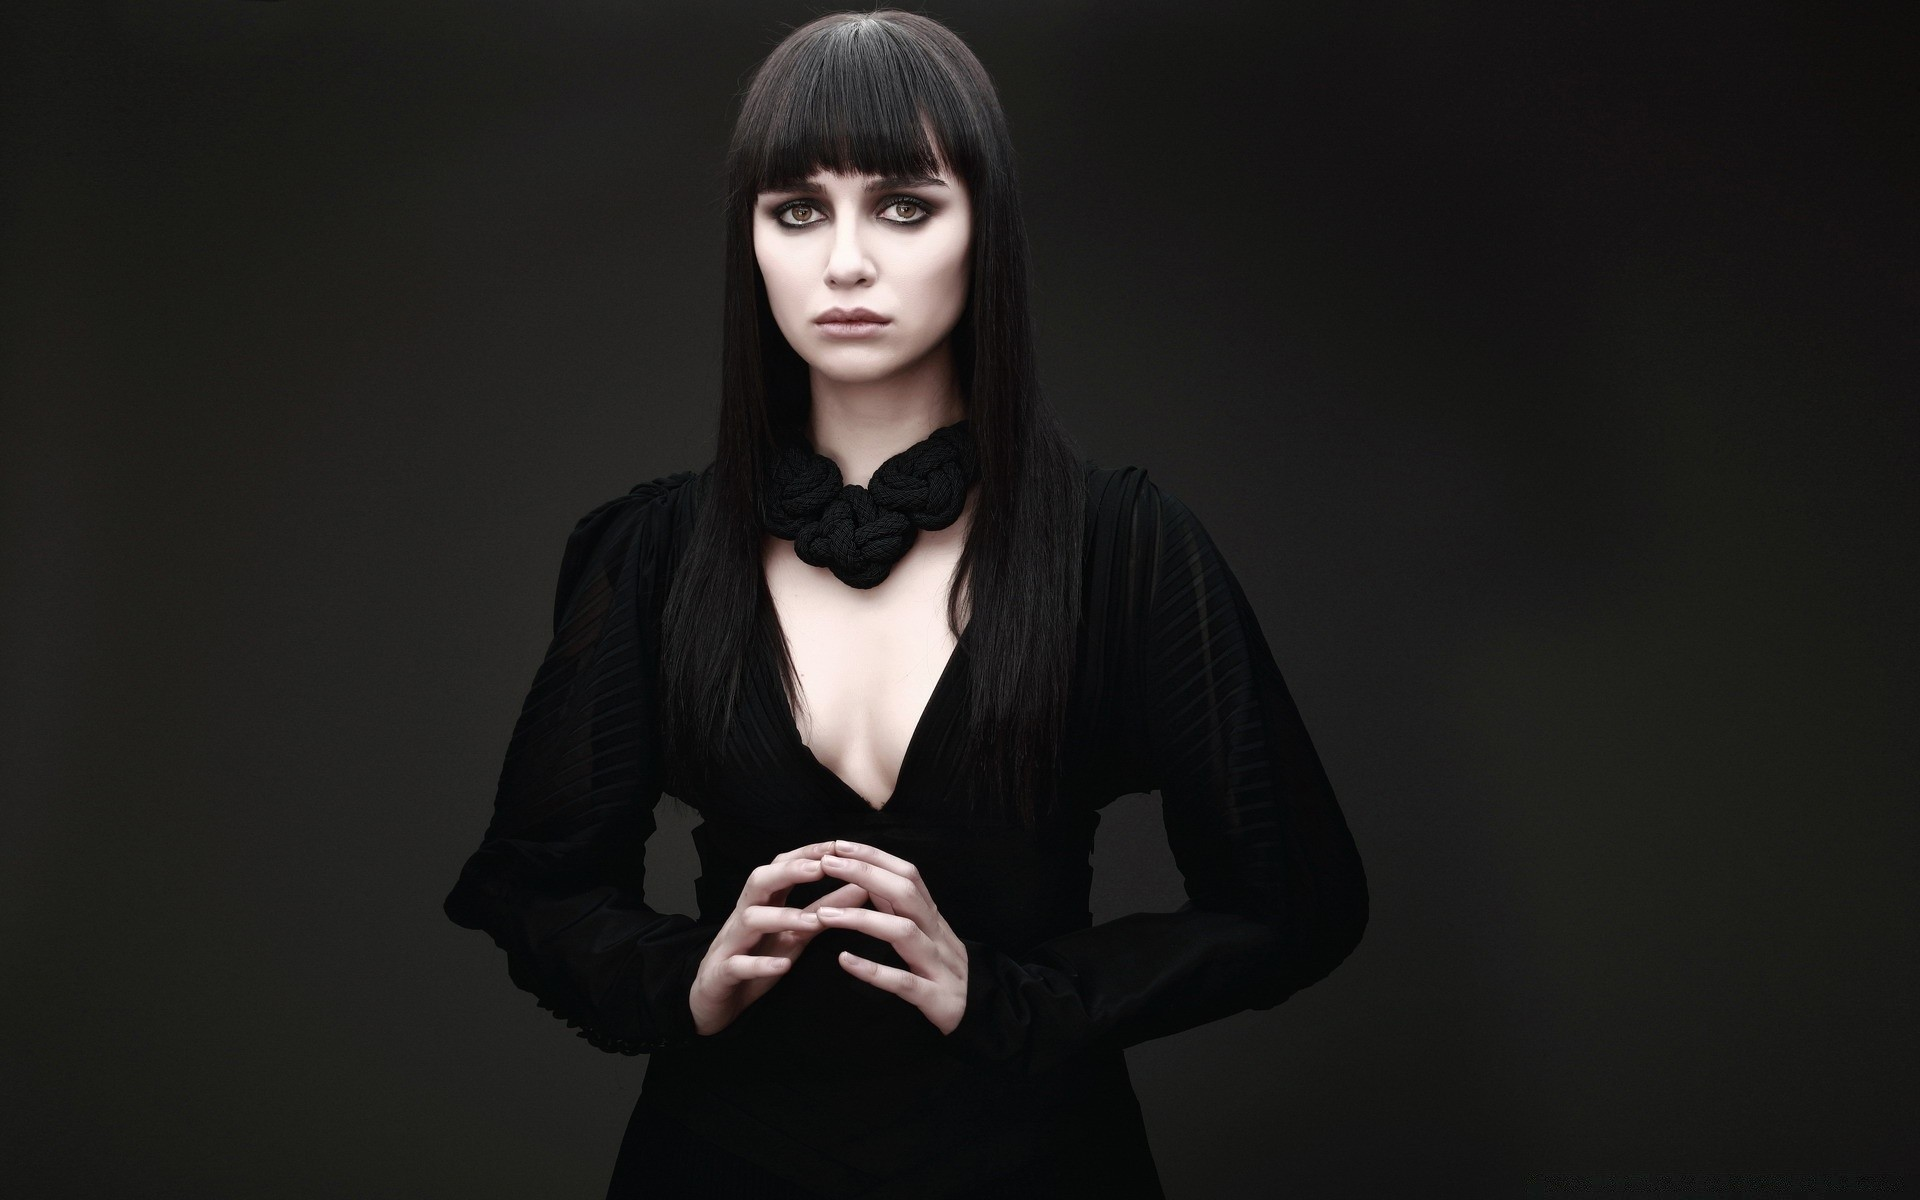 devushka-v-chernom-foto